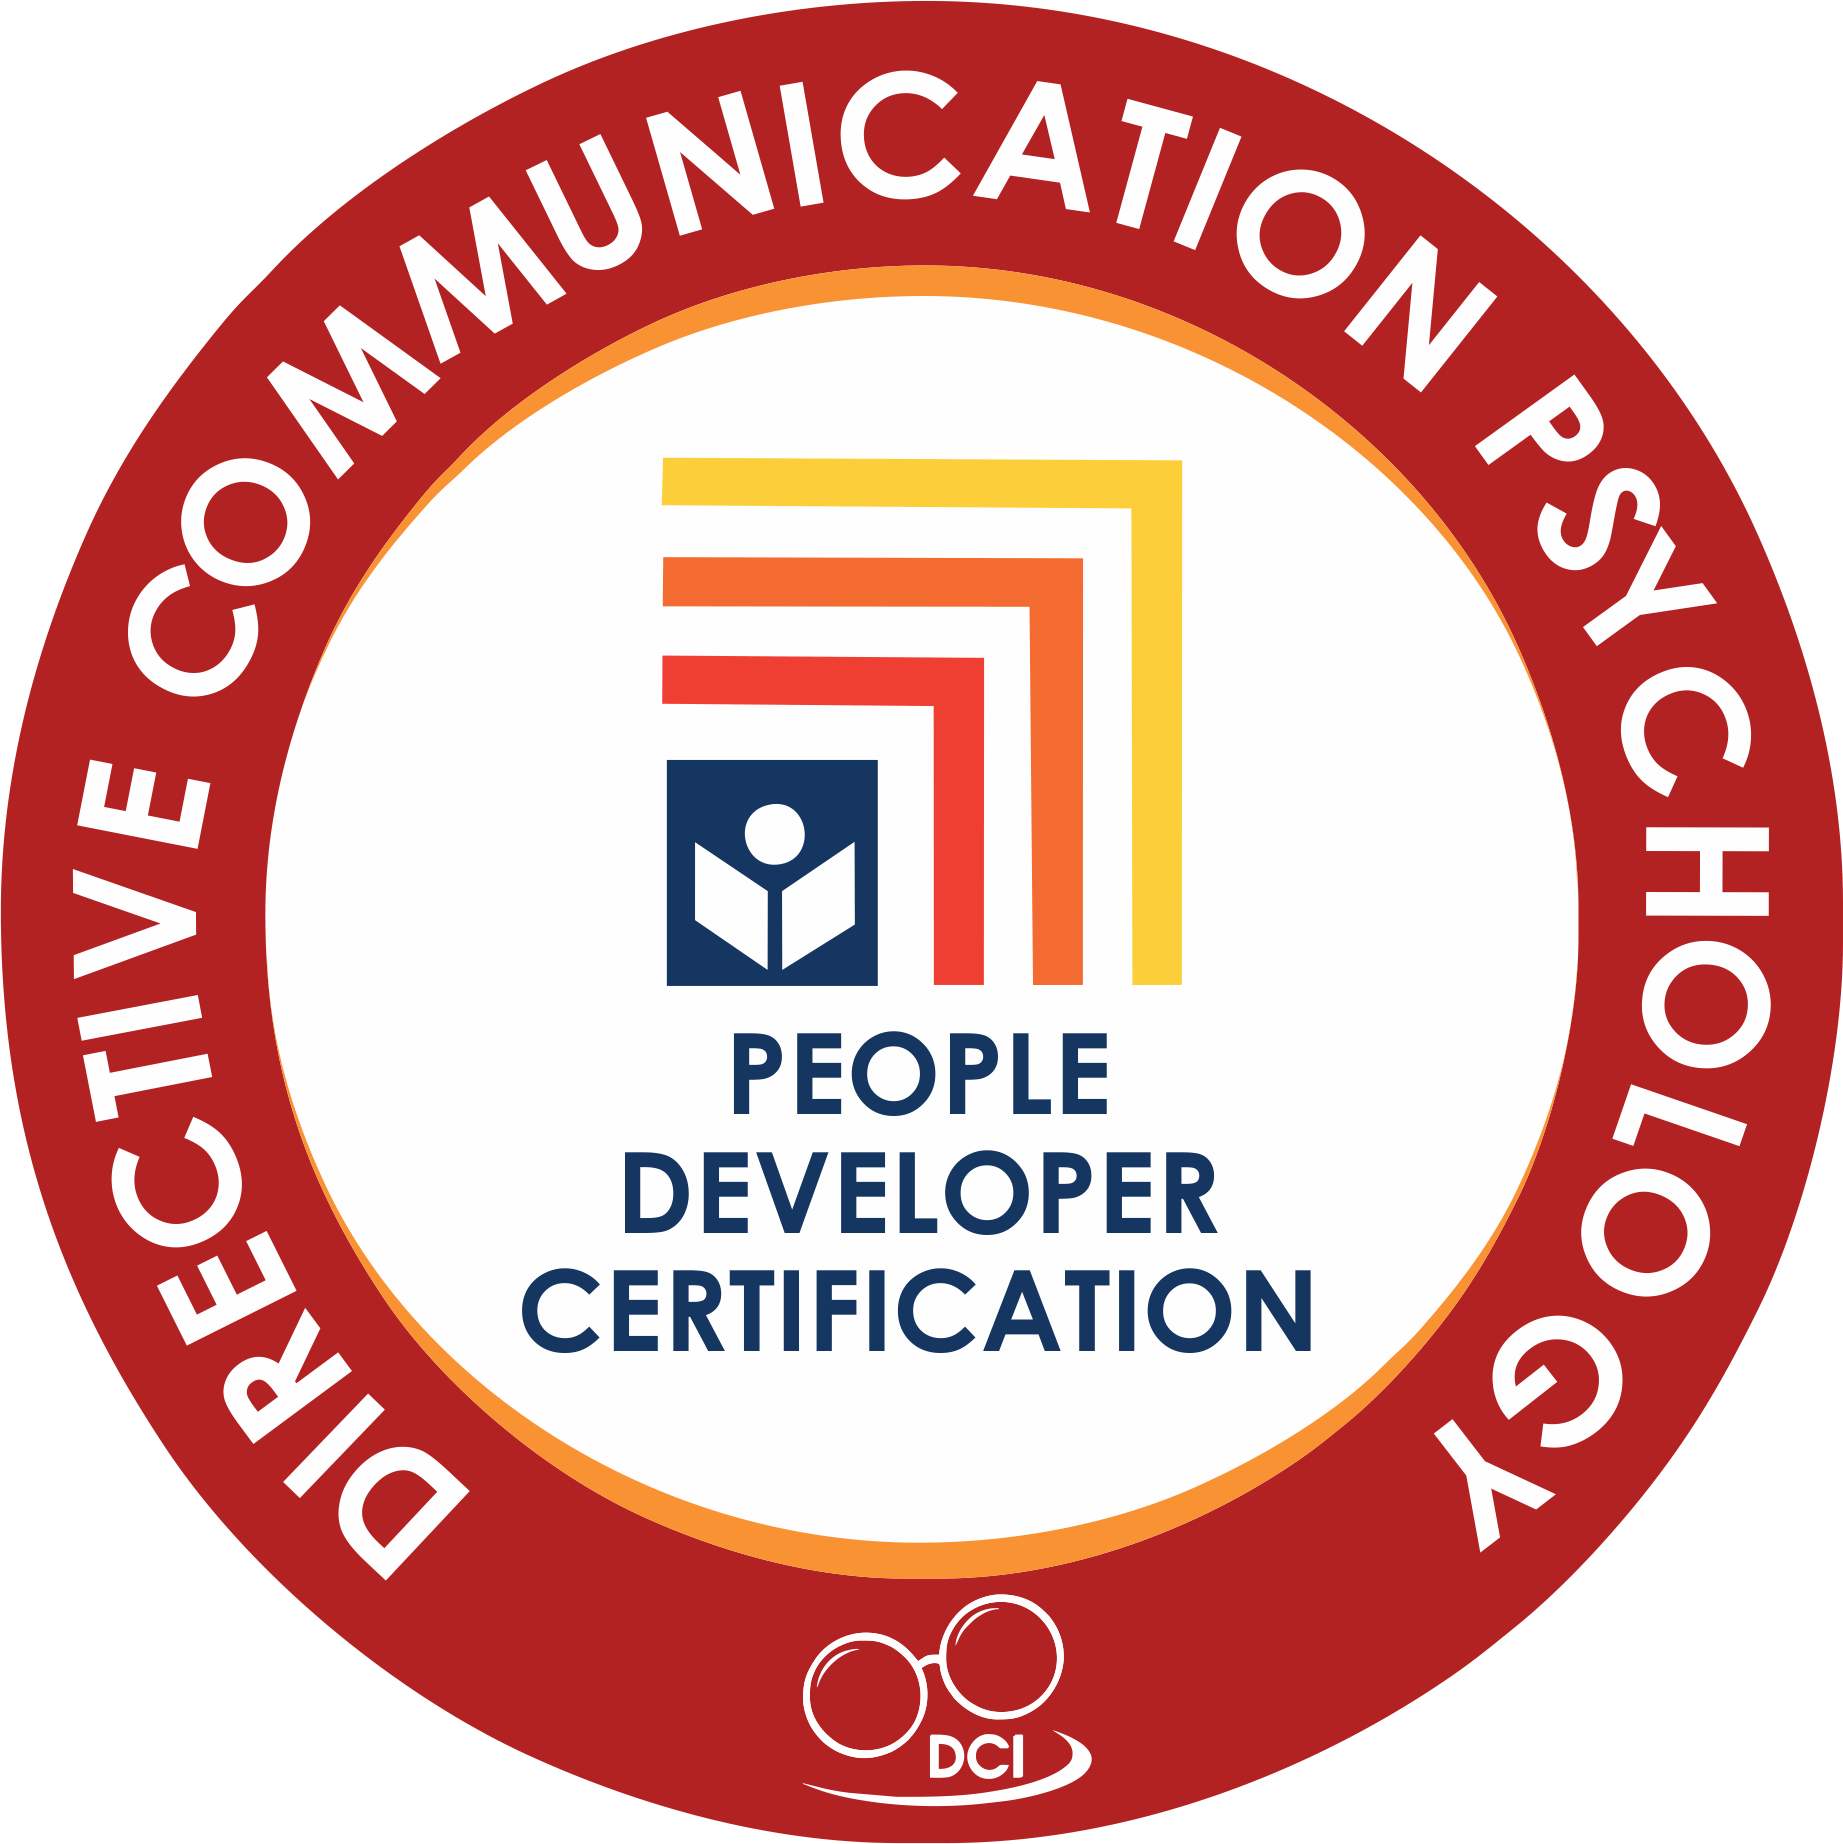 people-developer